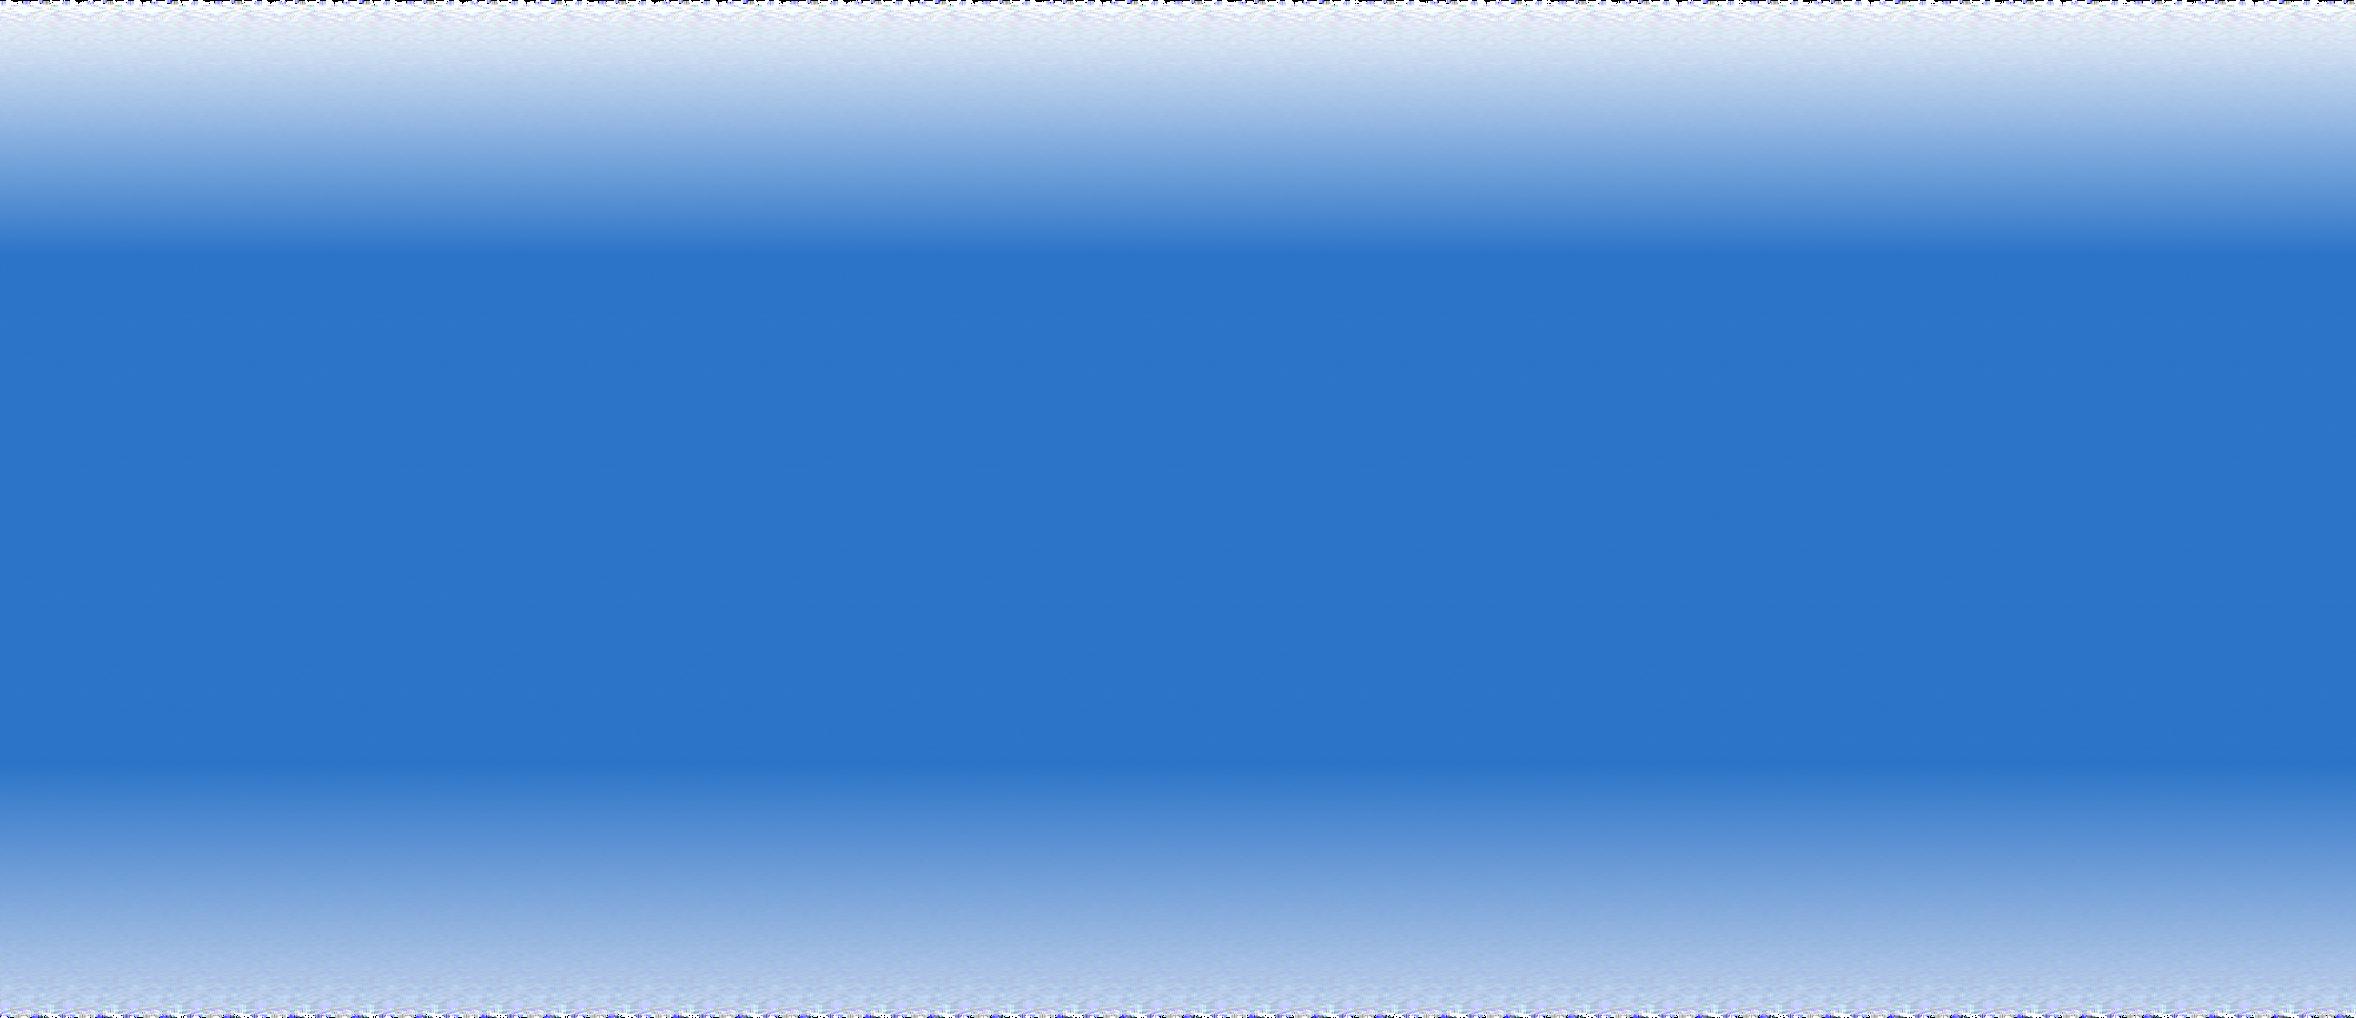 Blue Gradient